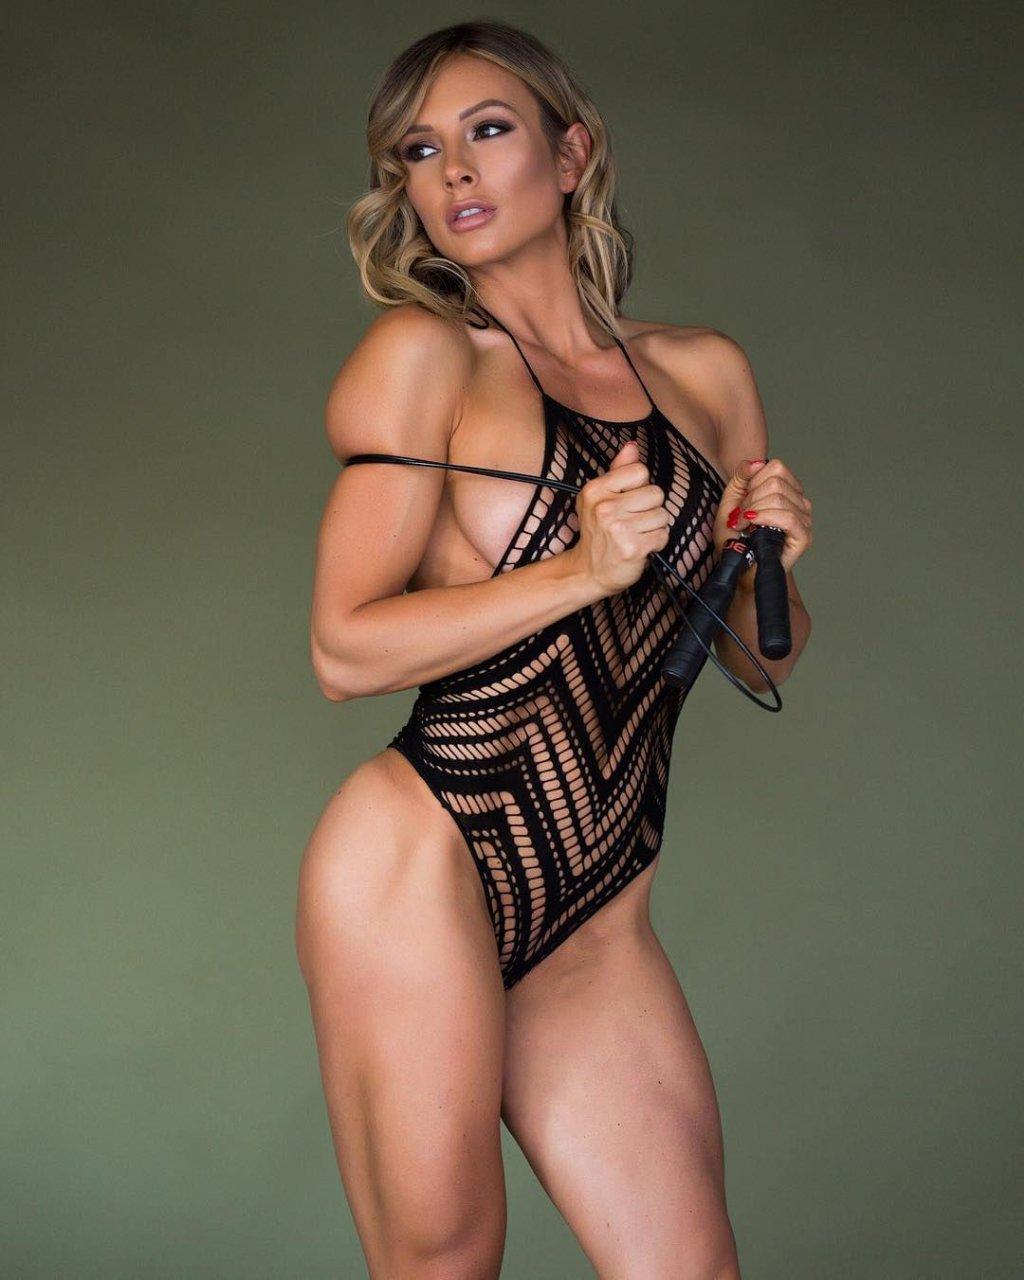 Paige hathaway porn